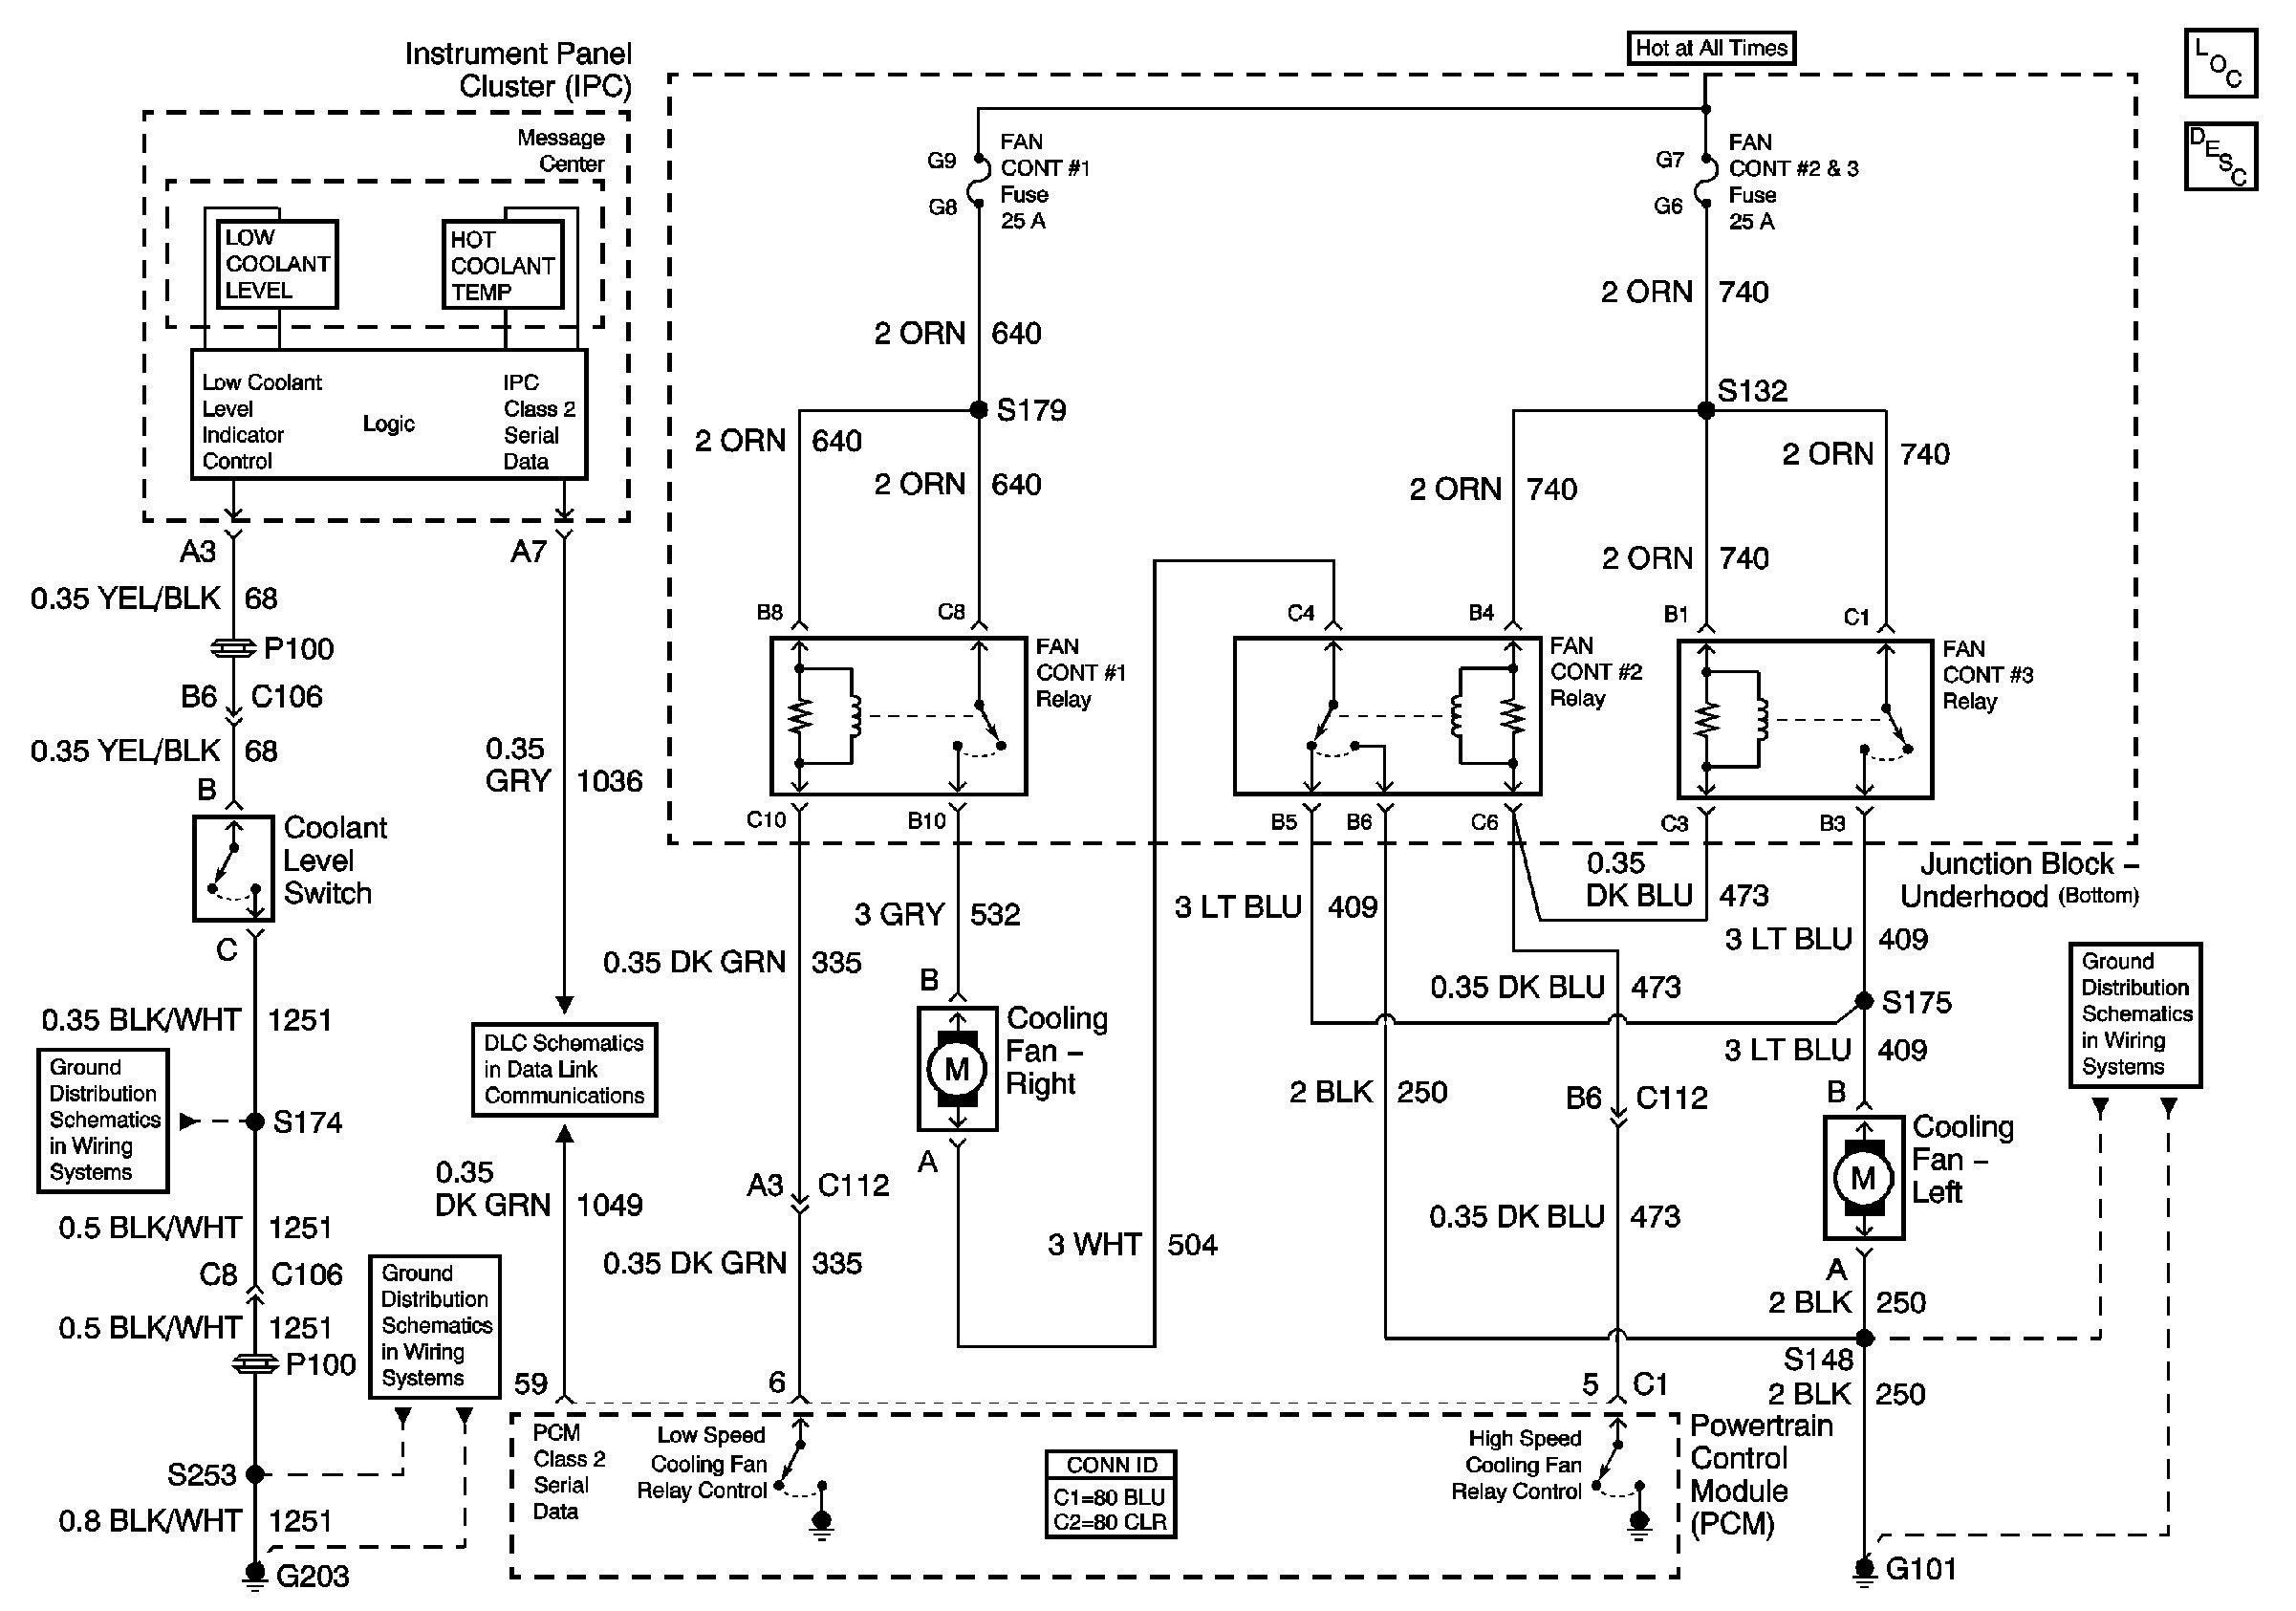 Unique Wiring Diagram For Electric Fan Relay Diagram Diagramsample Diagramtemplate Wiringdiagram Diagramchart Workshee Electric Fan Diagram Chart Diagram